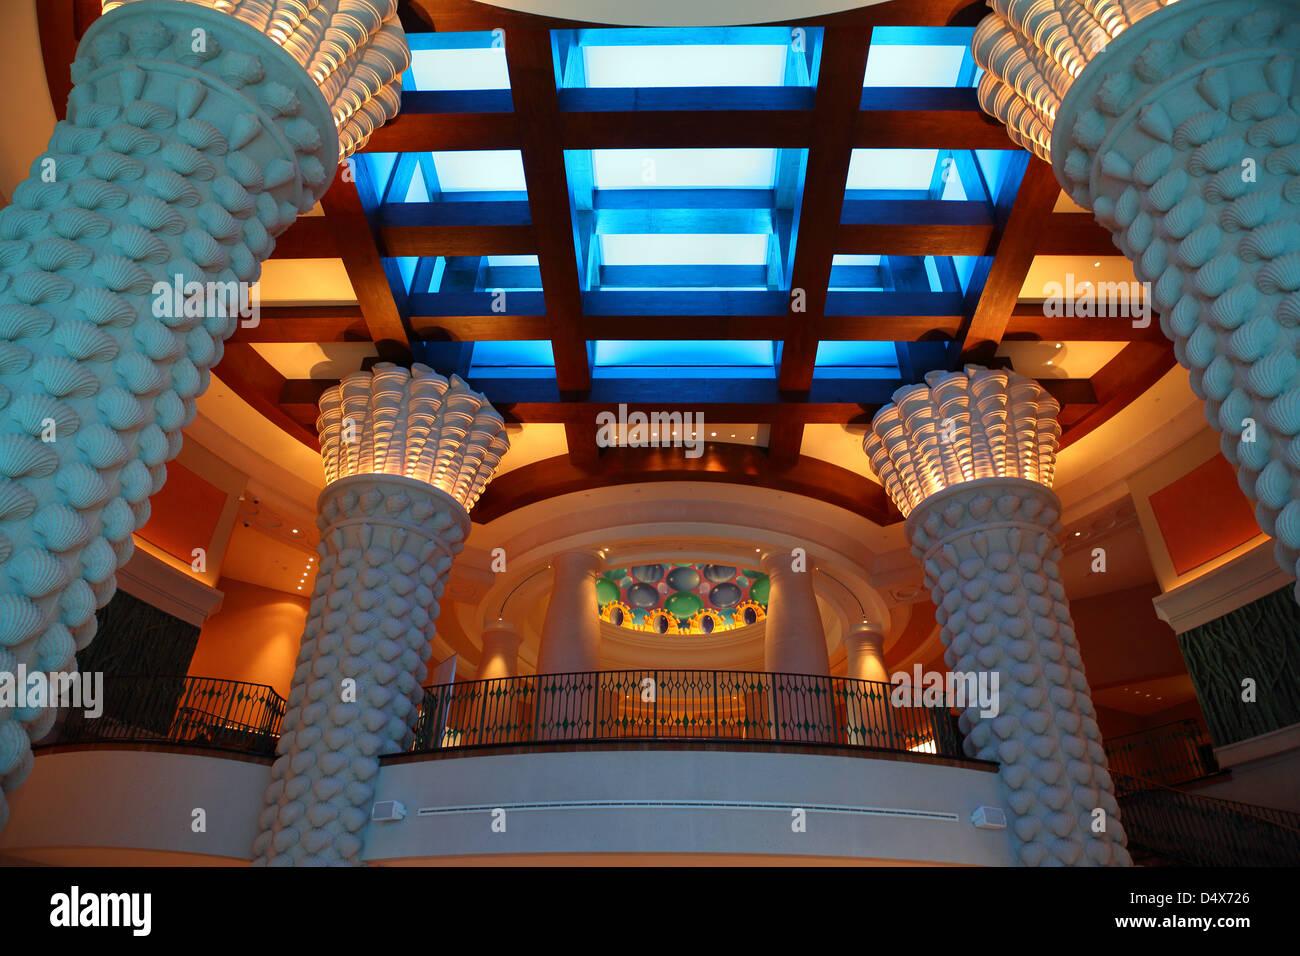 Interior shot of the Atlantis hotel, Dubai, United Arab Emirates - Stock Image